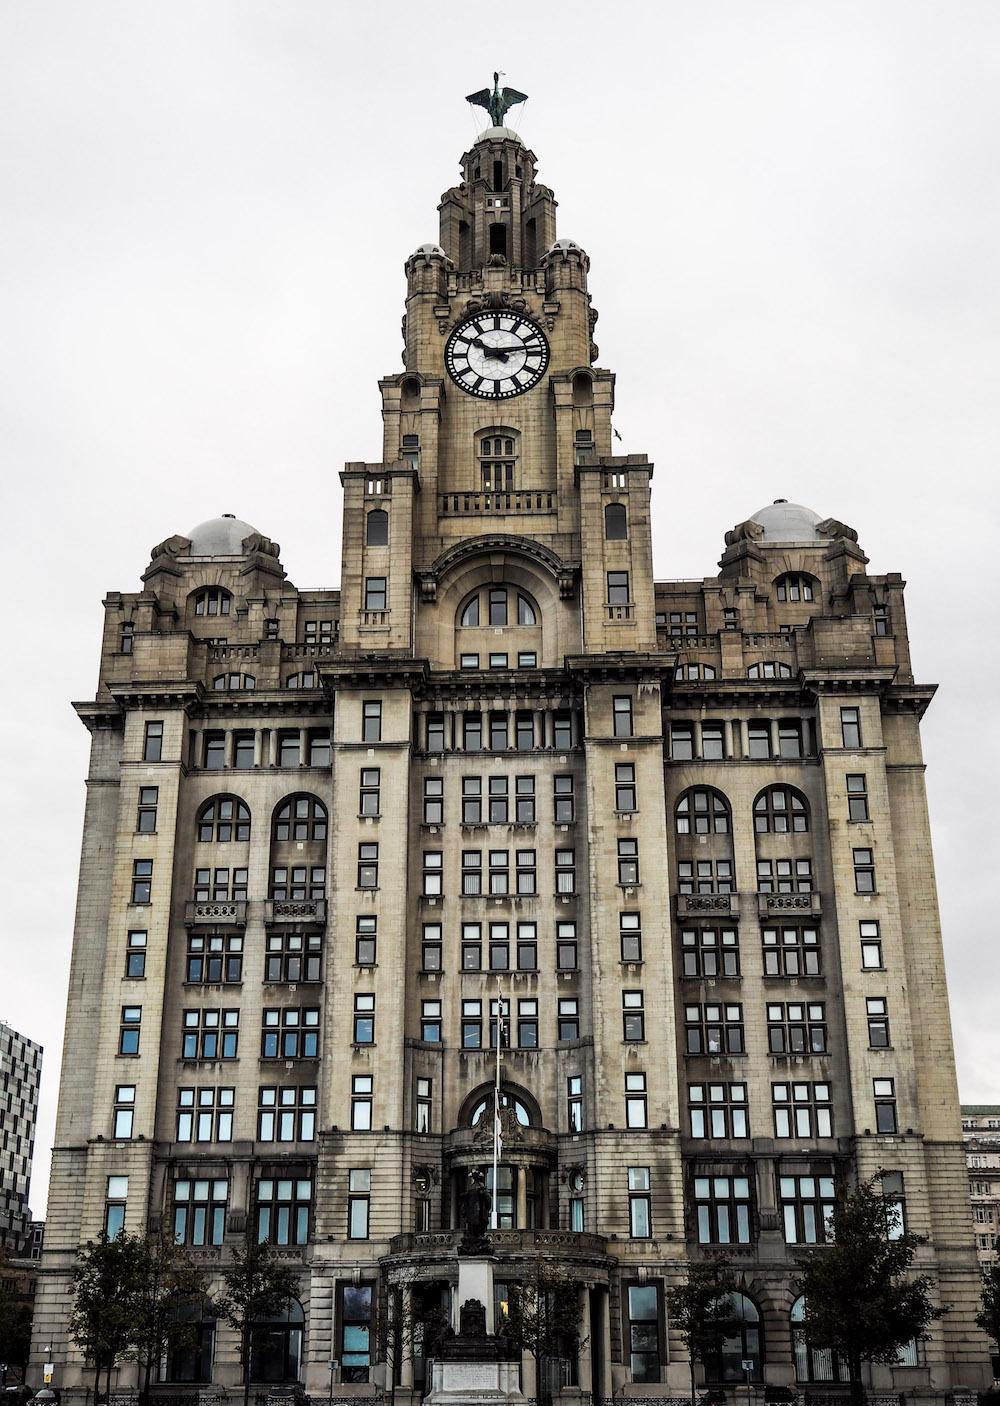 The Liverpool Docks